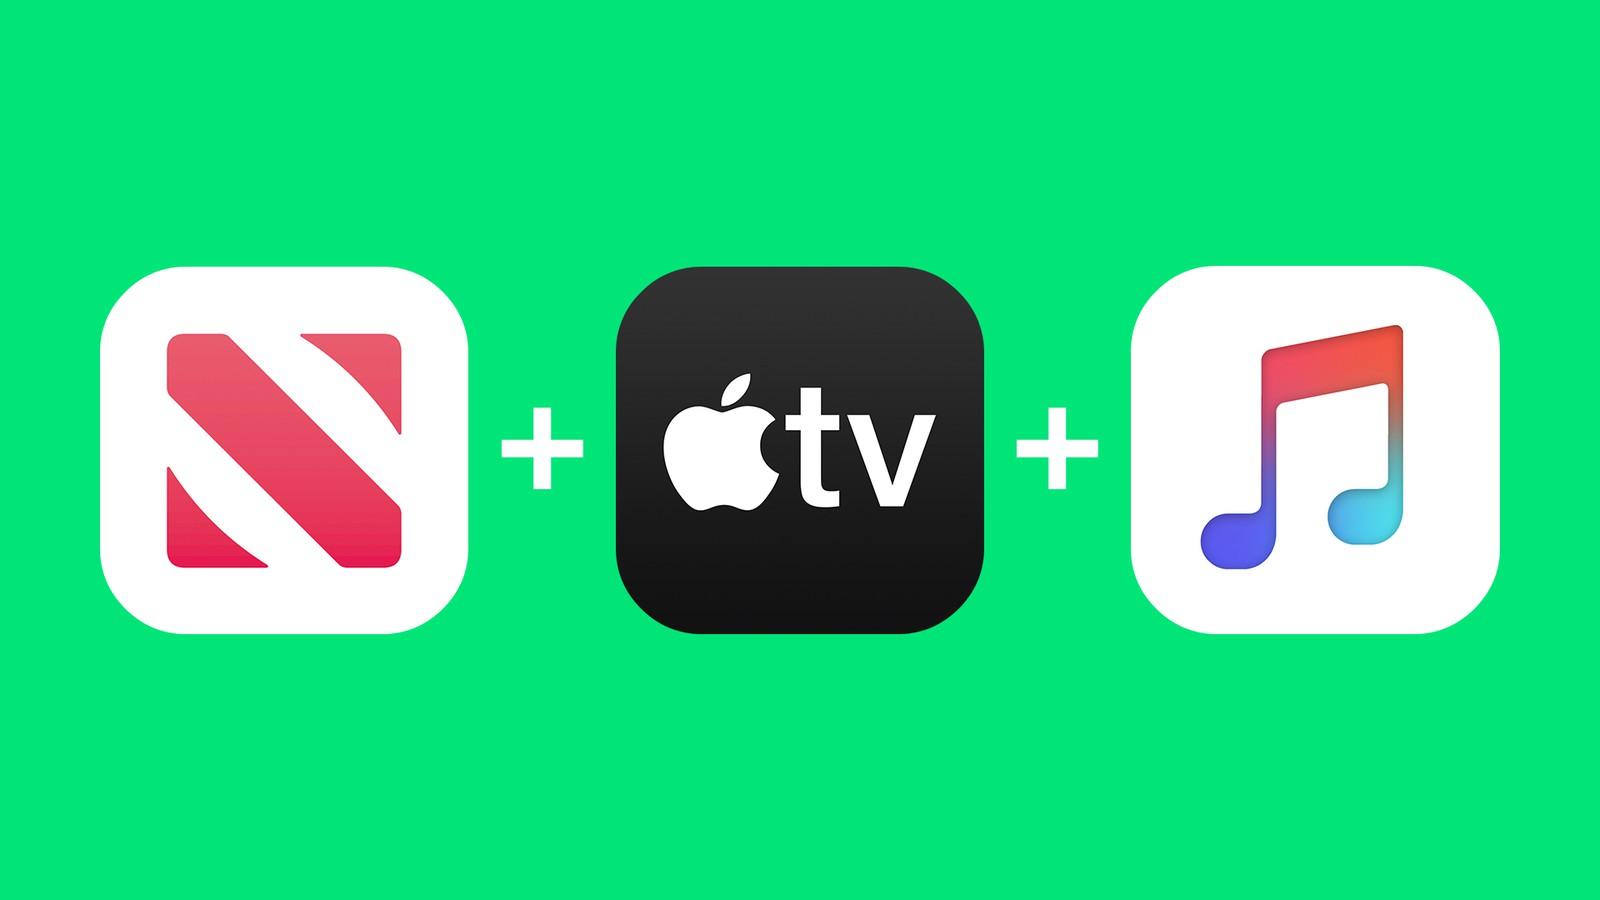 Apple-Services-Bundle.jpg